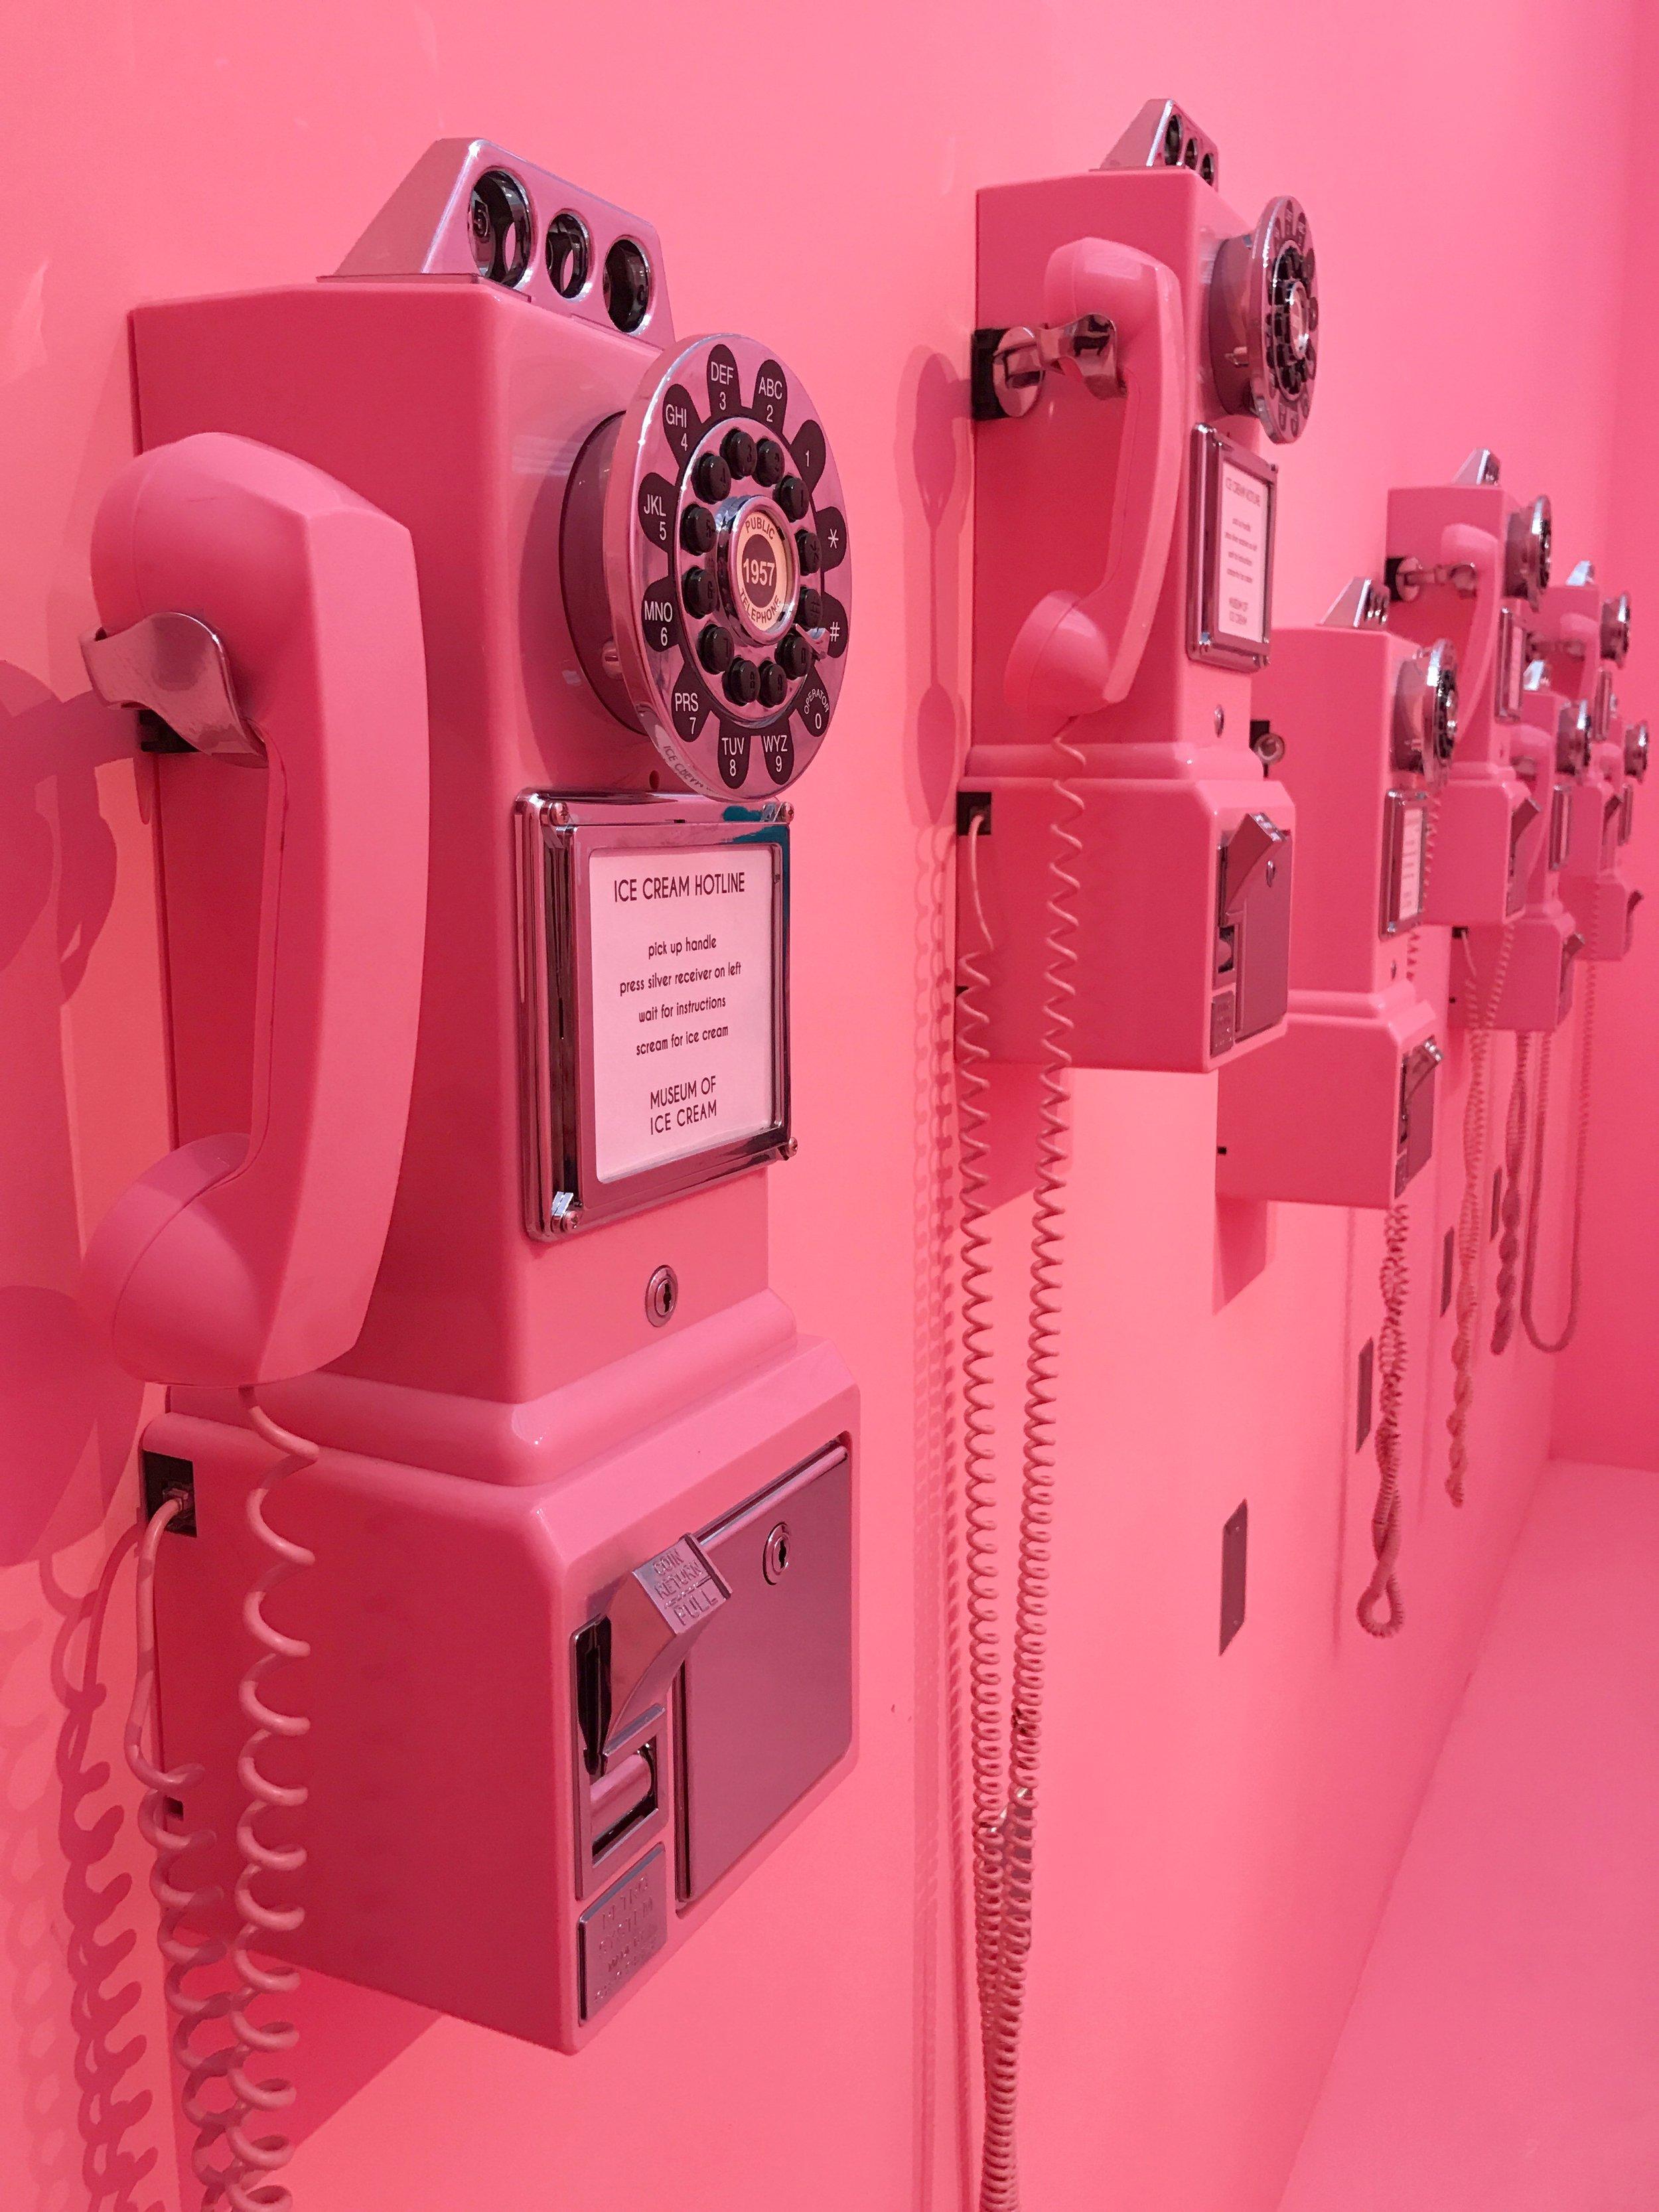 Hot Pink Telephones